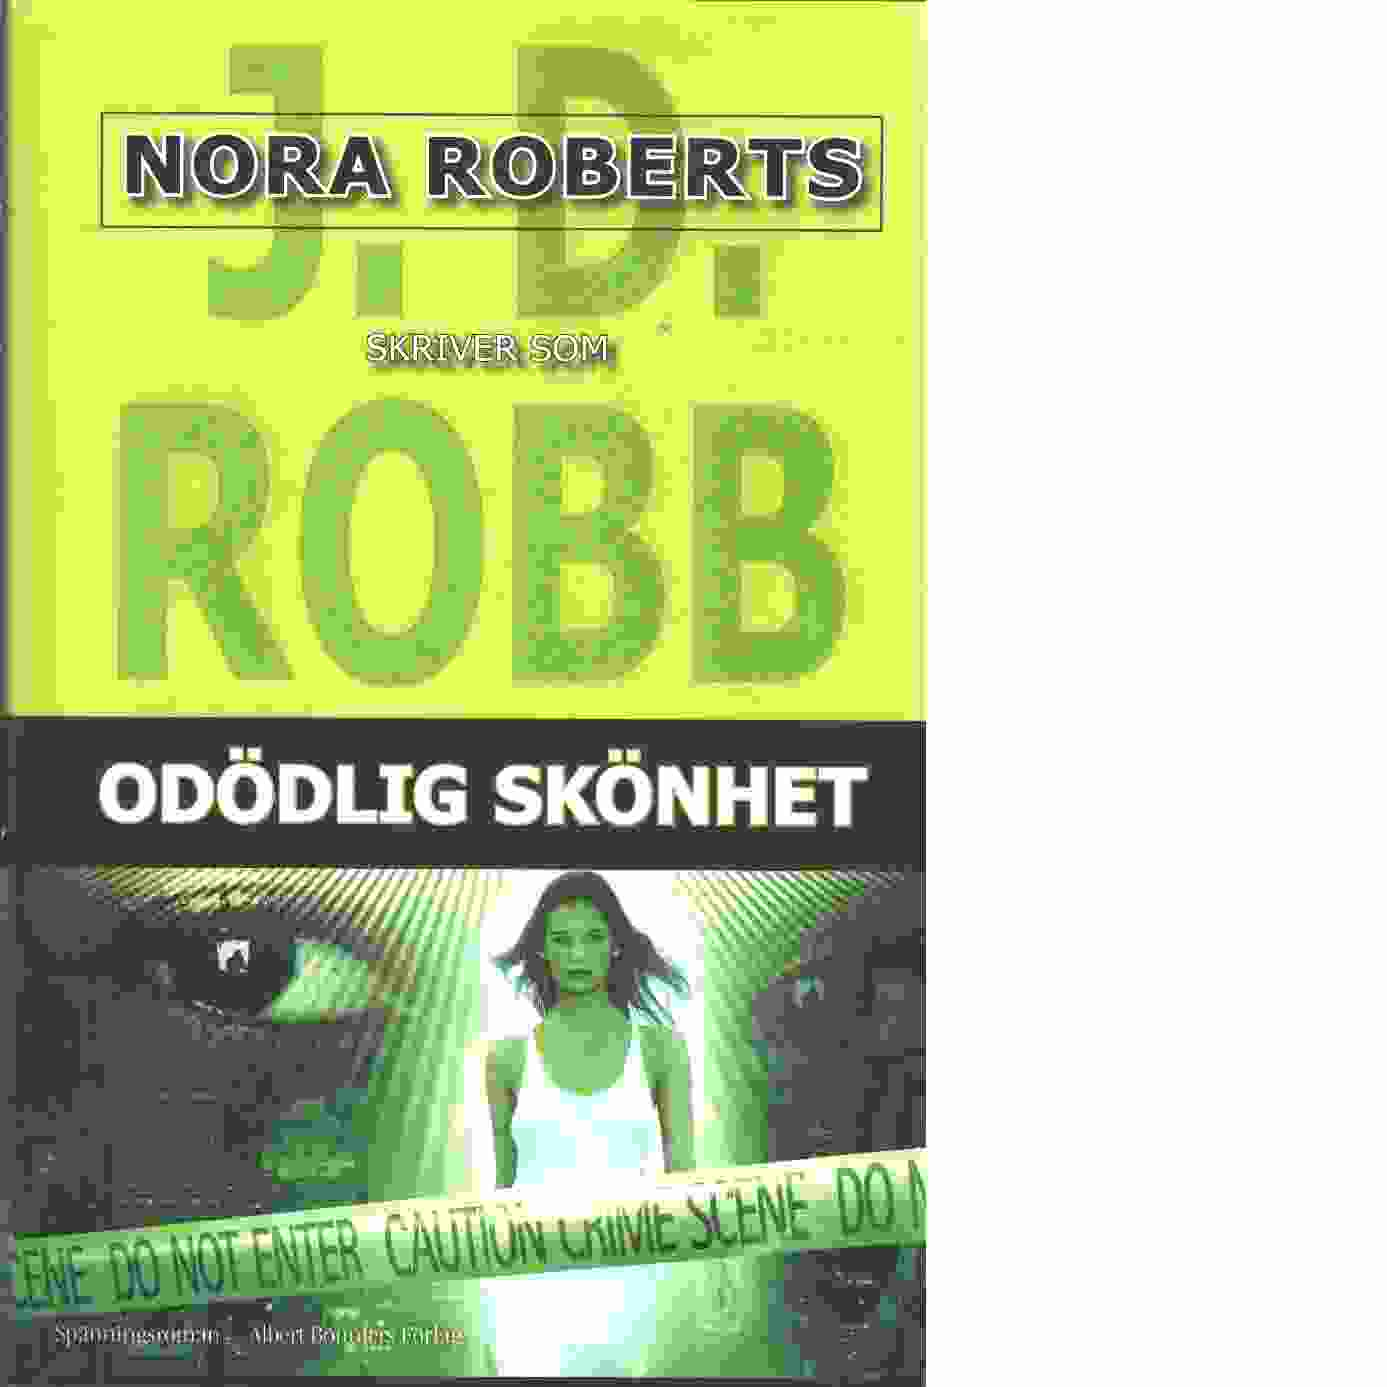 Odödlig skönhet - Robb, J. D synonym Roberts, Nora